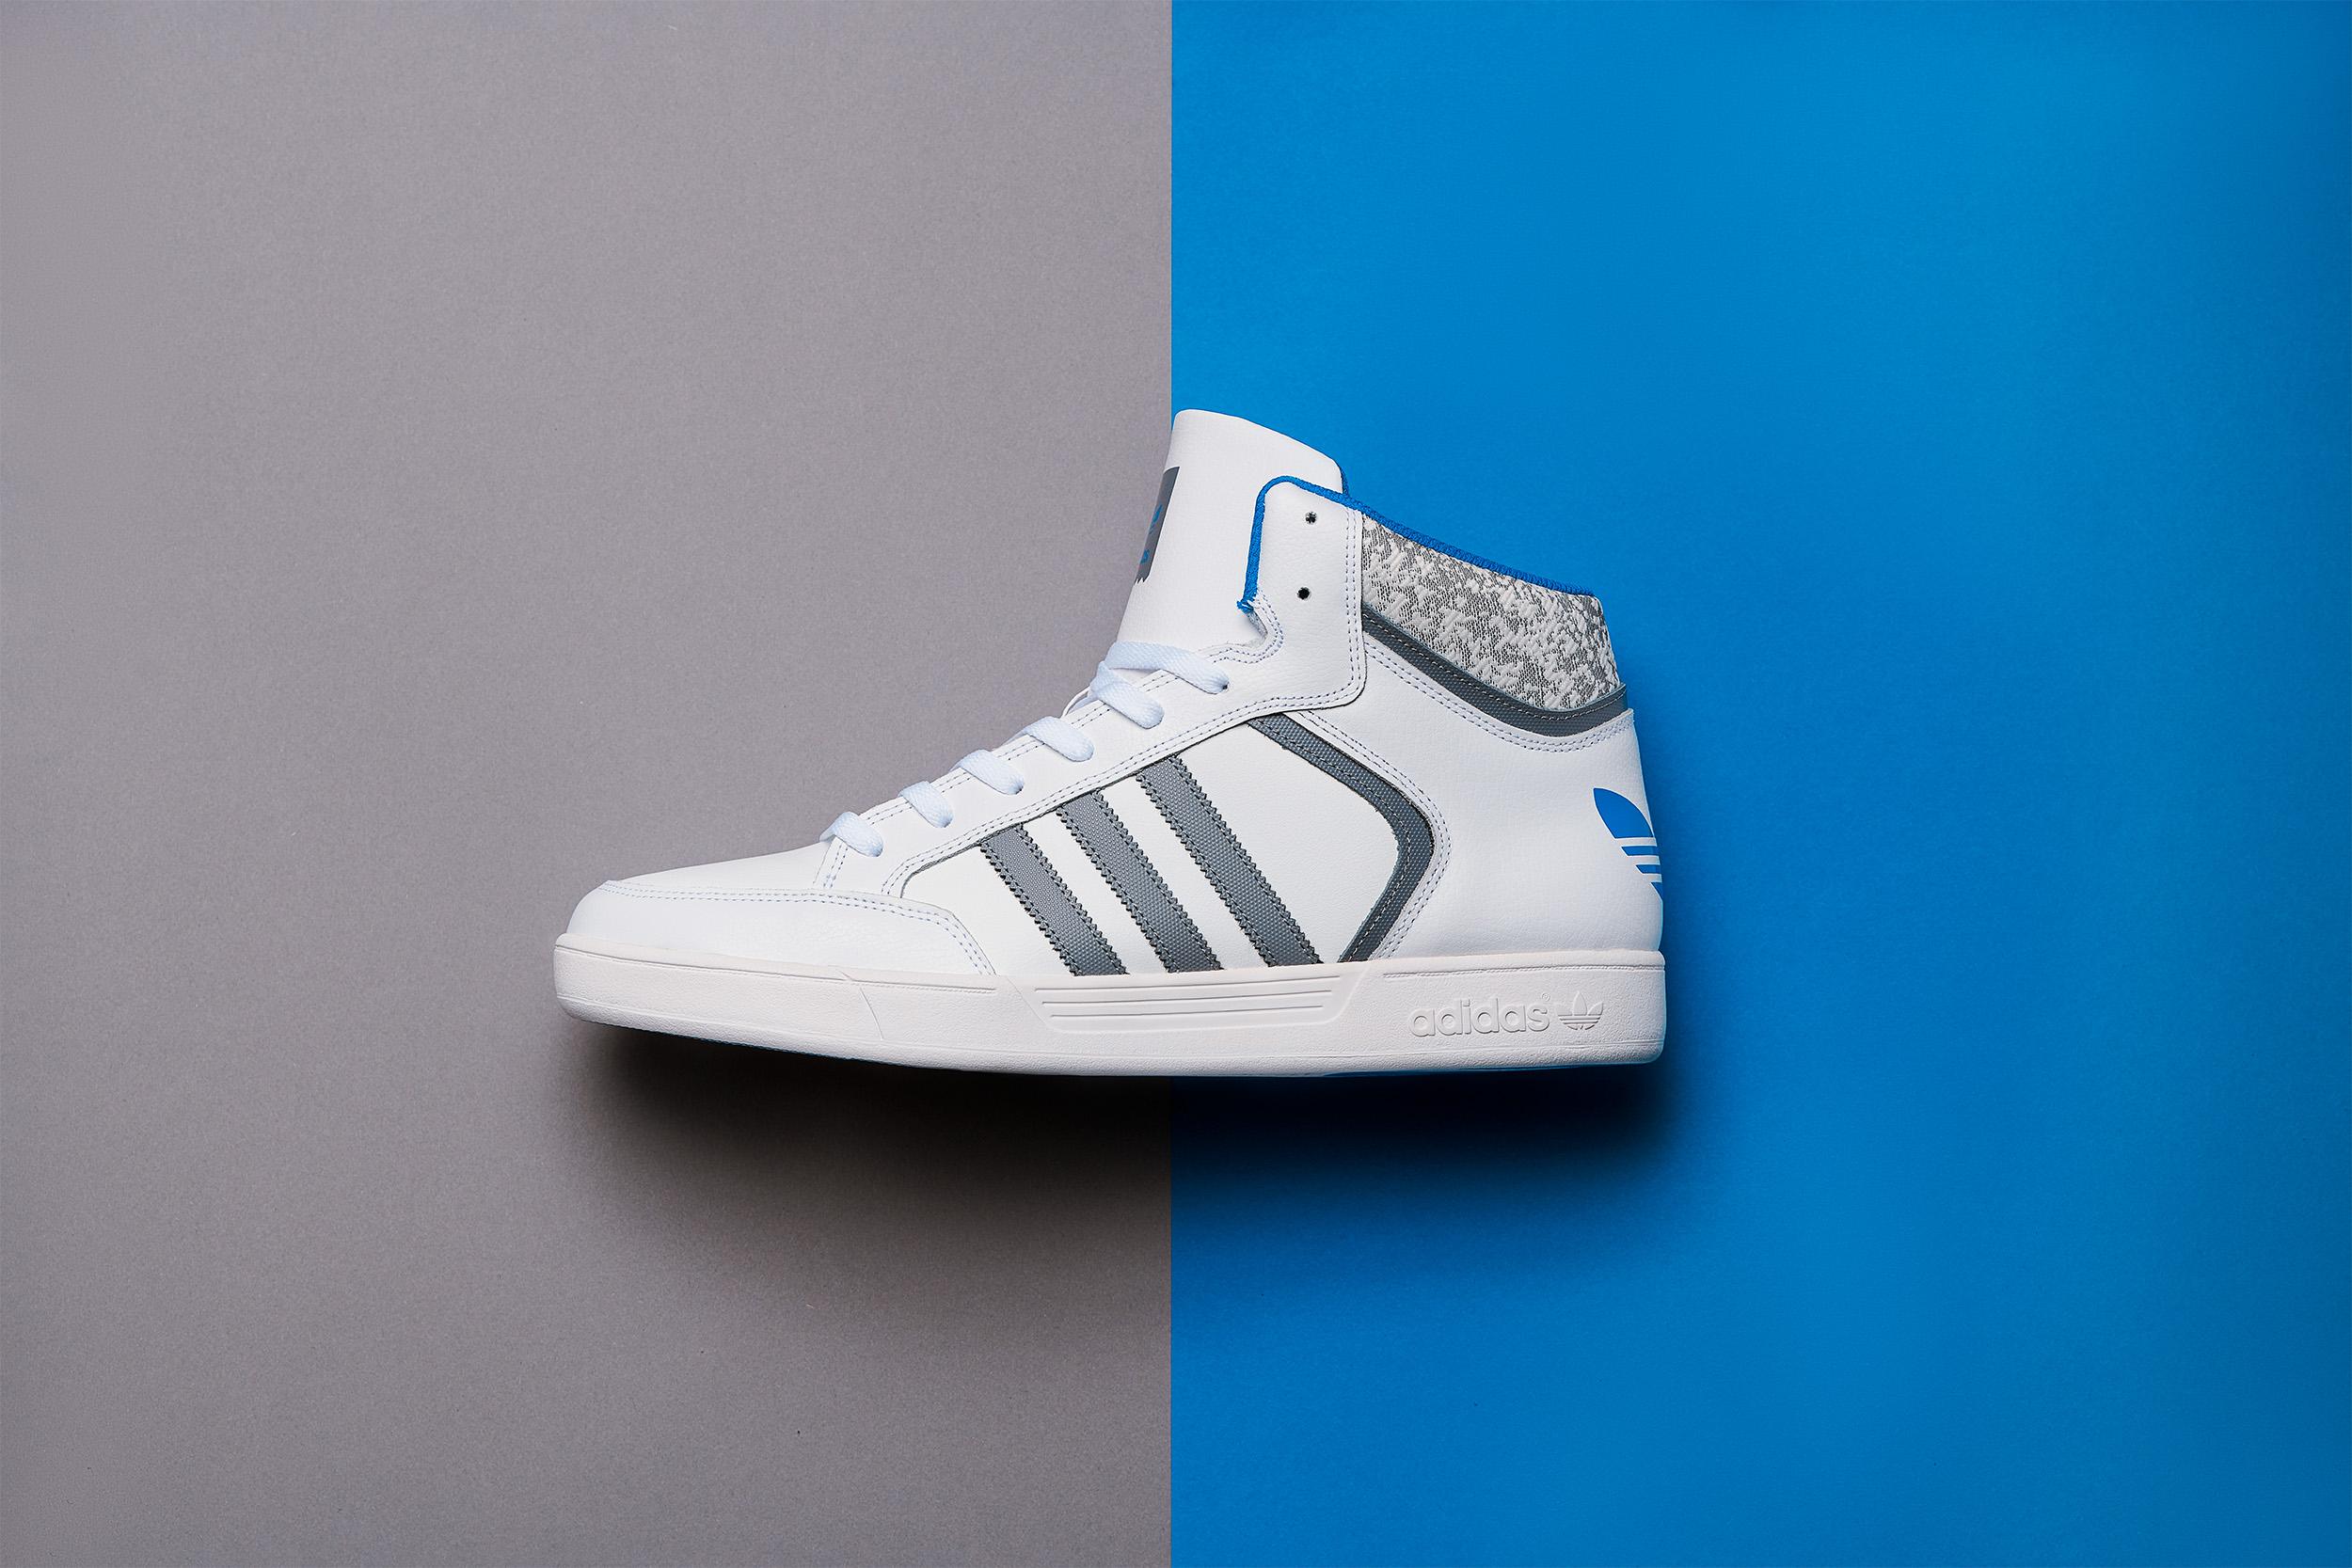 Adidas_Silver_Blue_Website